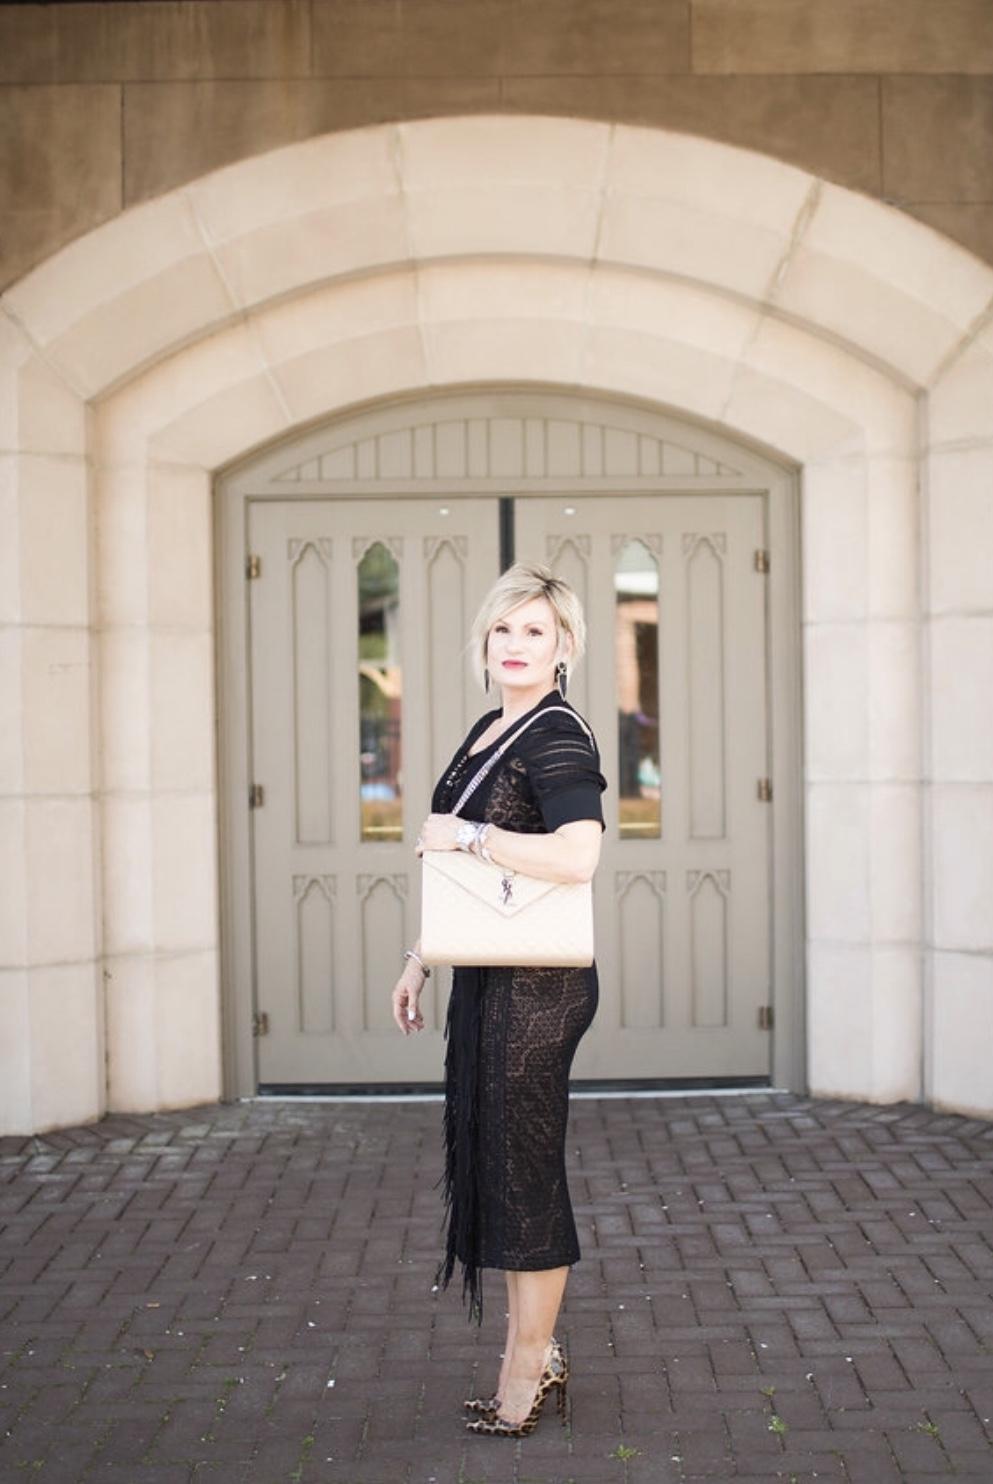 Shop the Little Black Dress look: Dress similar  here ; shoes similar  here ; handbag similar  here ; earrings  here.